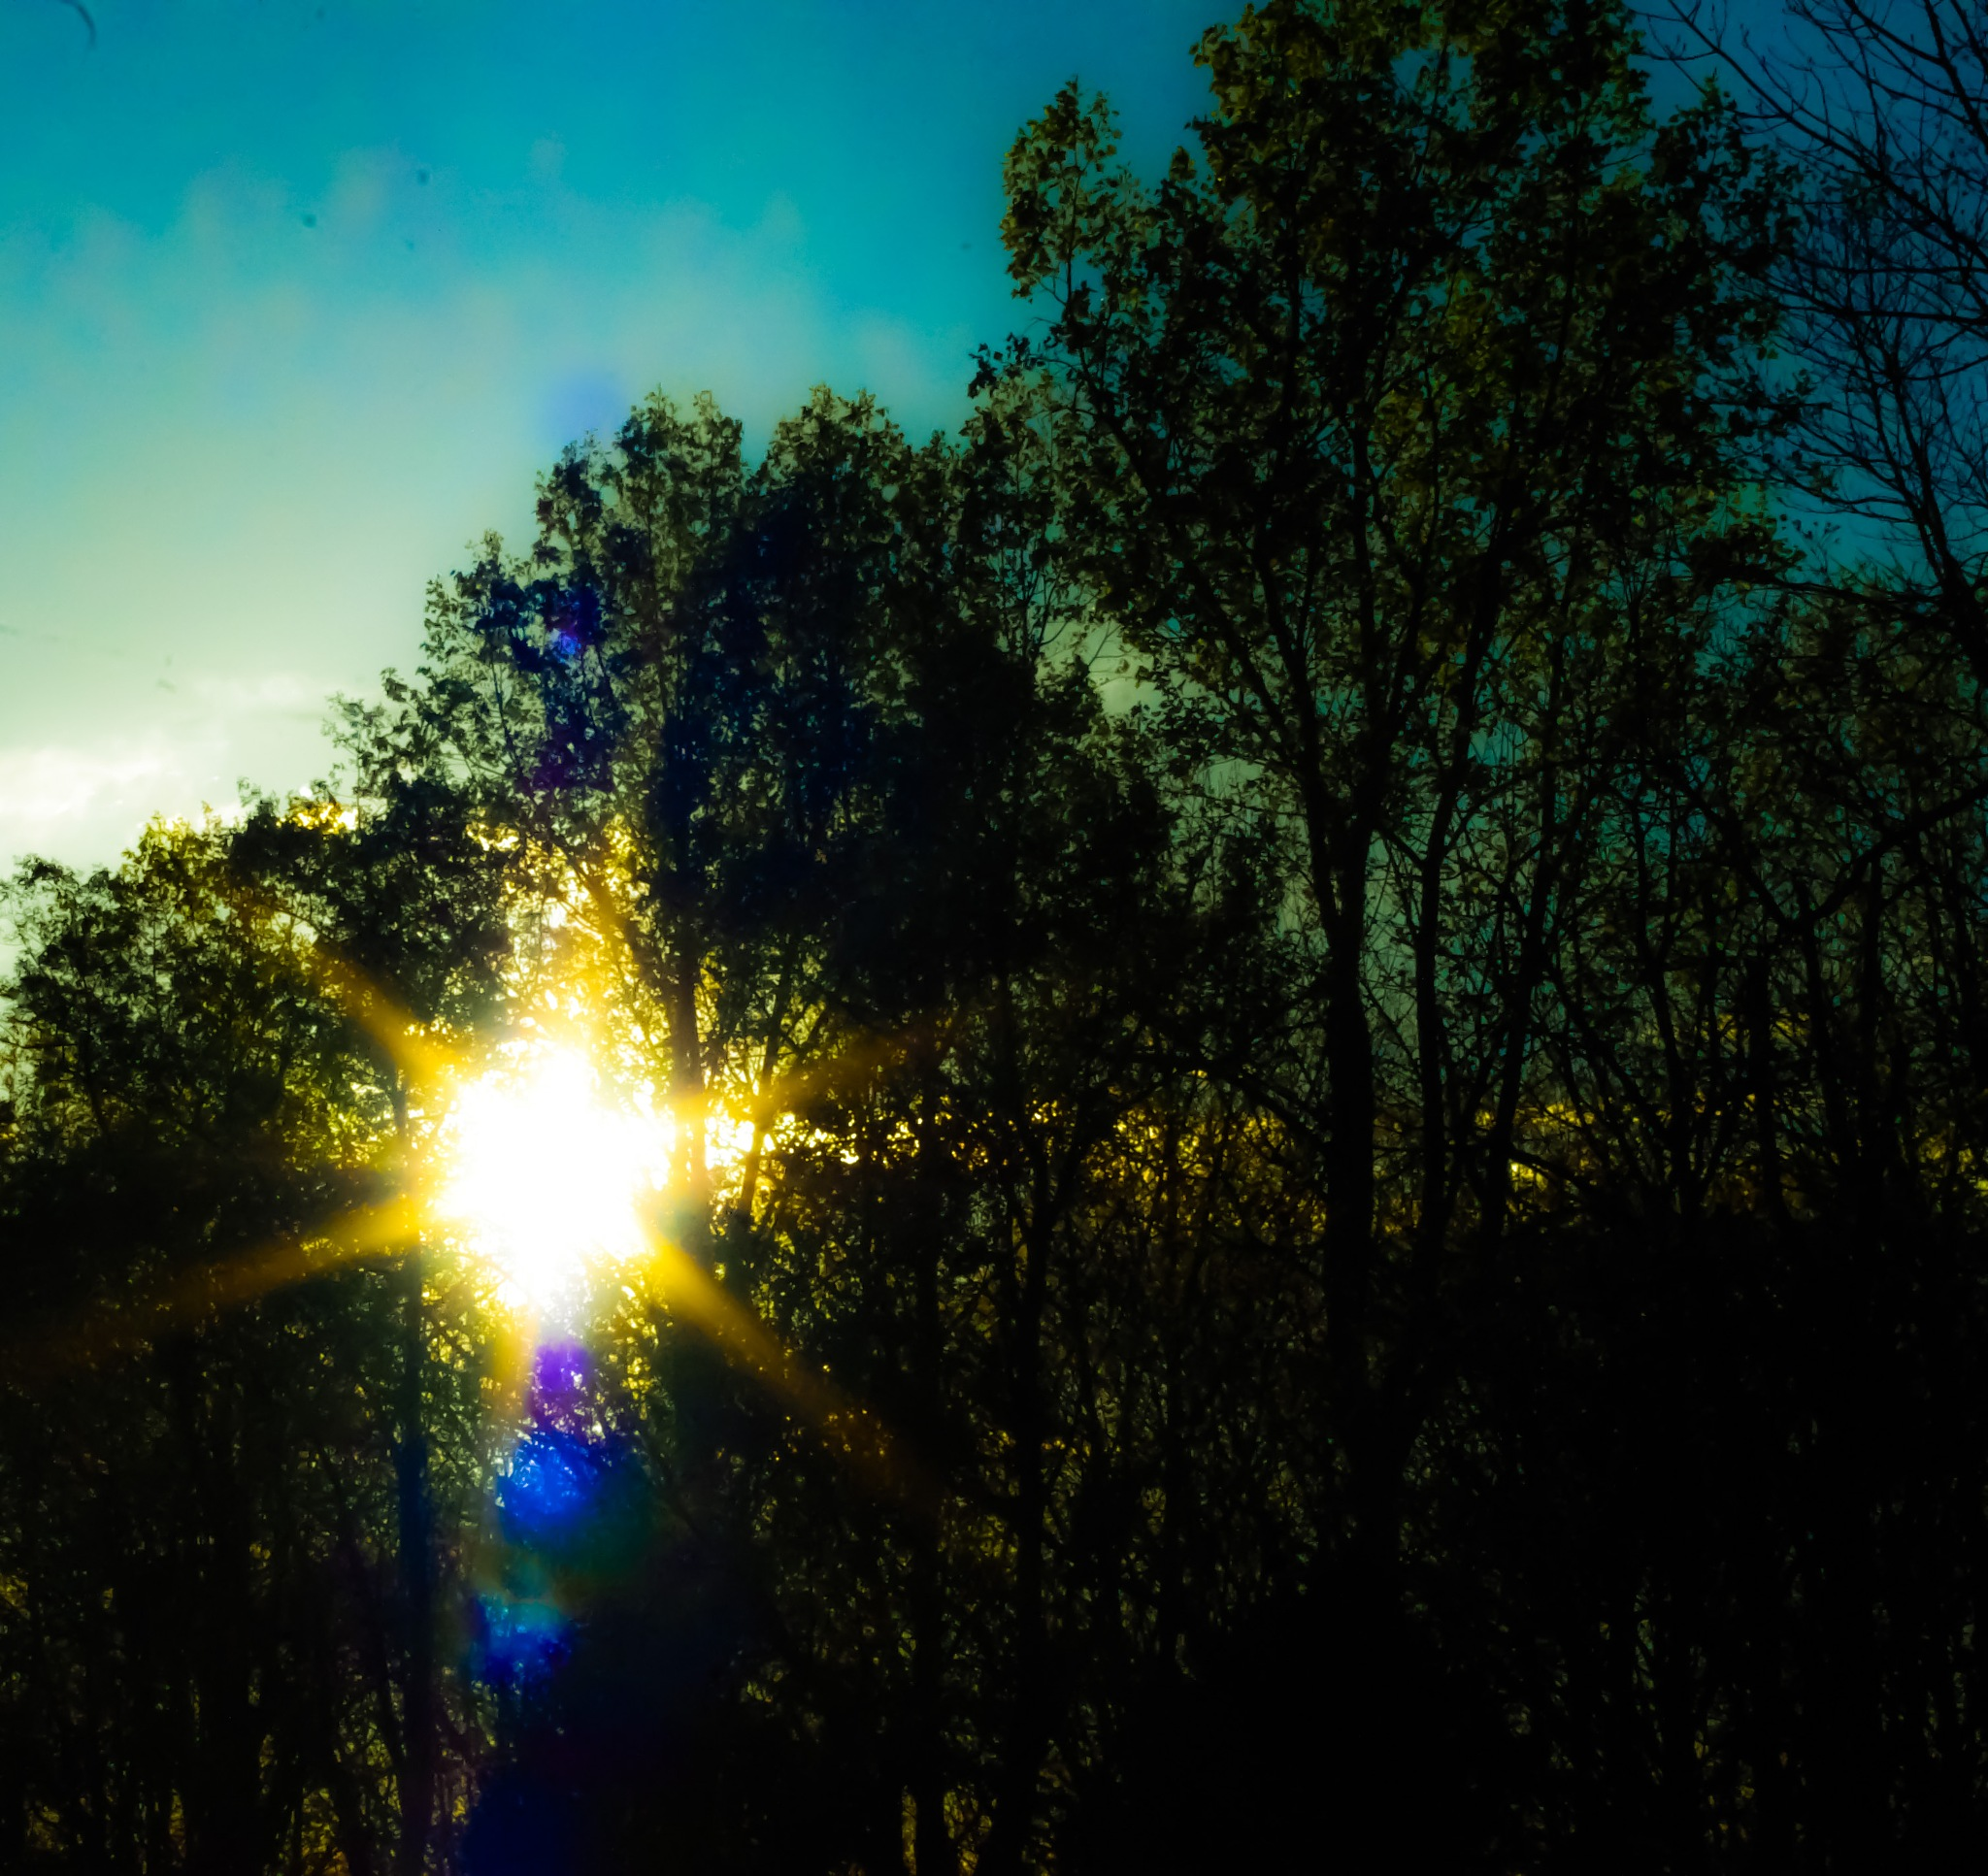 SUN SPOT BABY! by Bonnie Rhoades